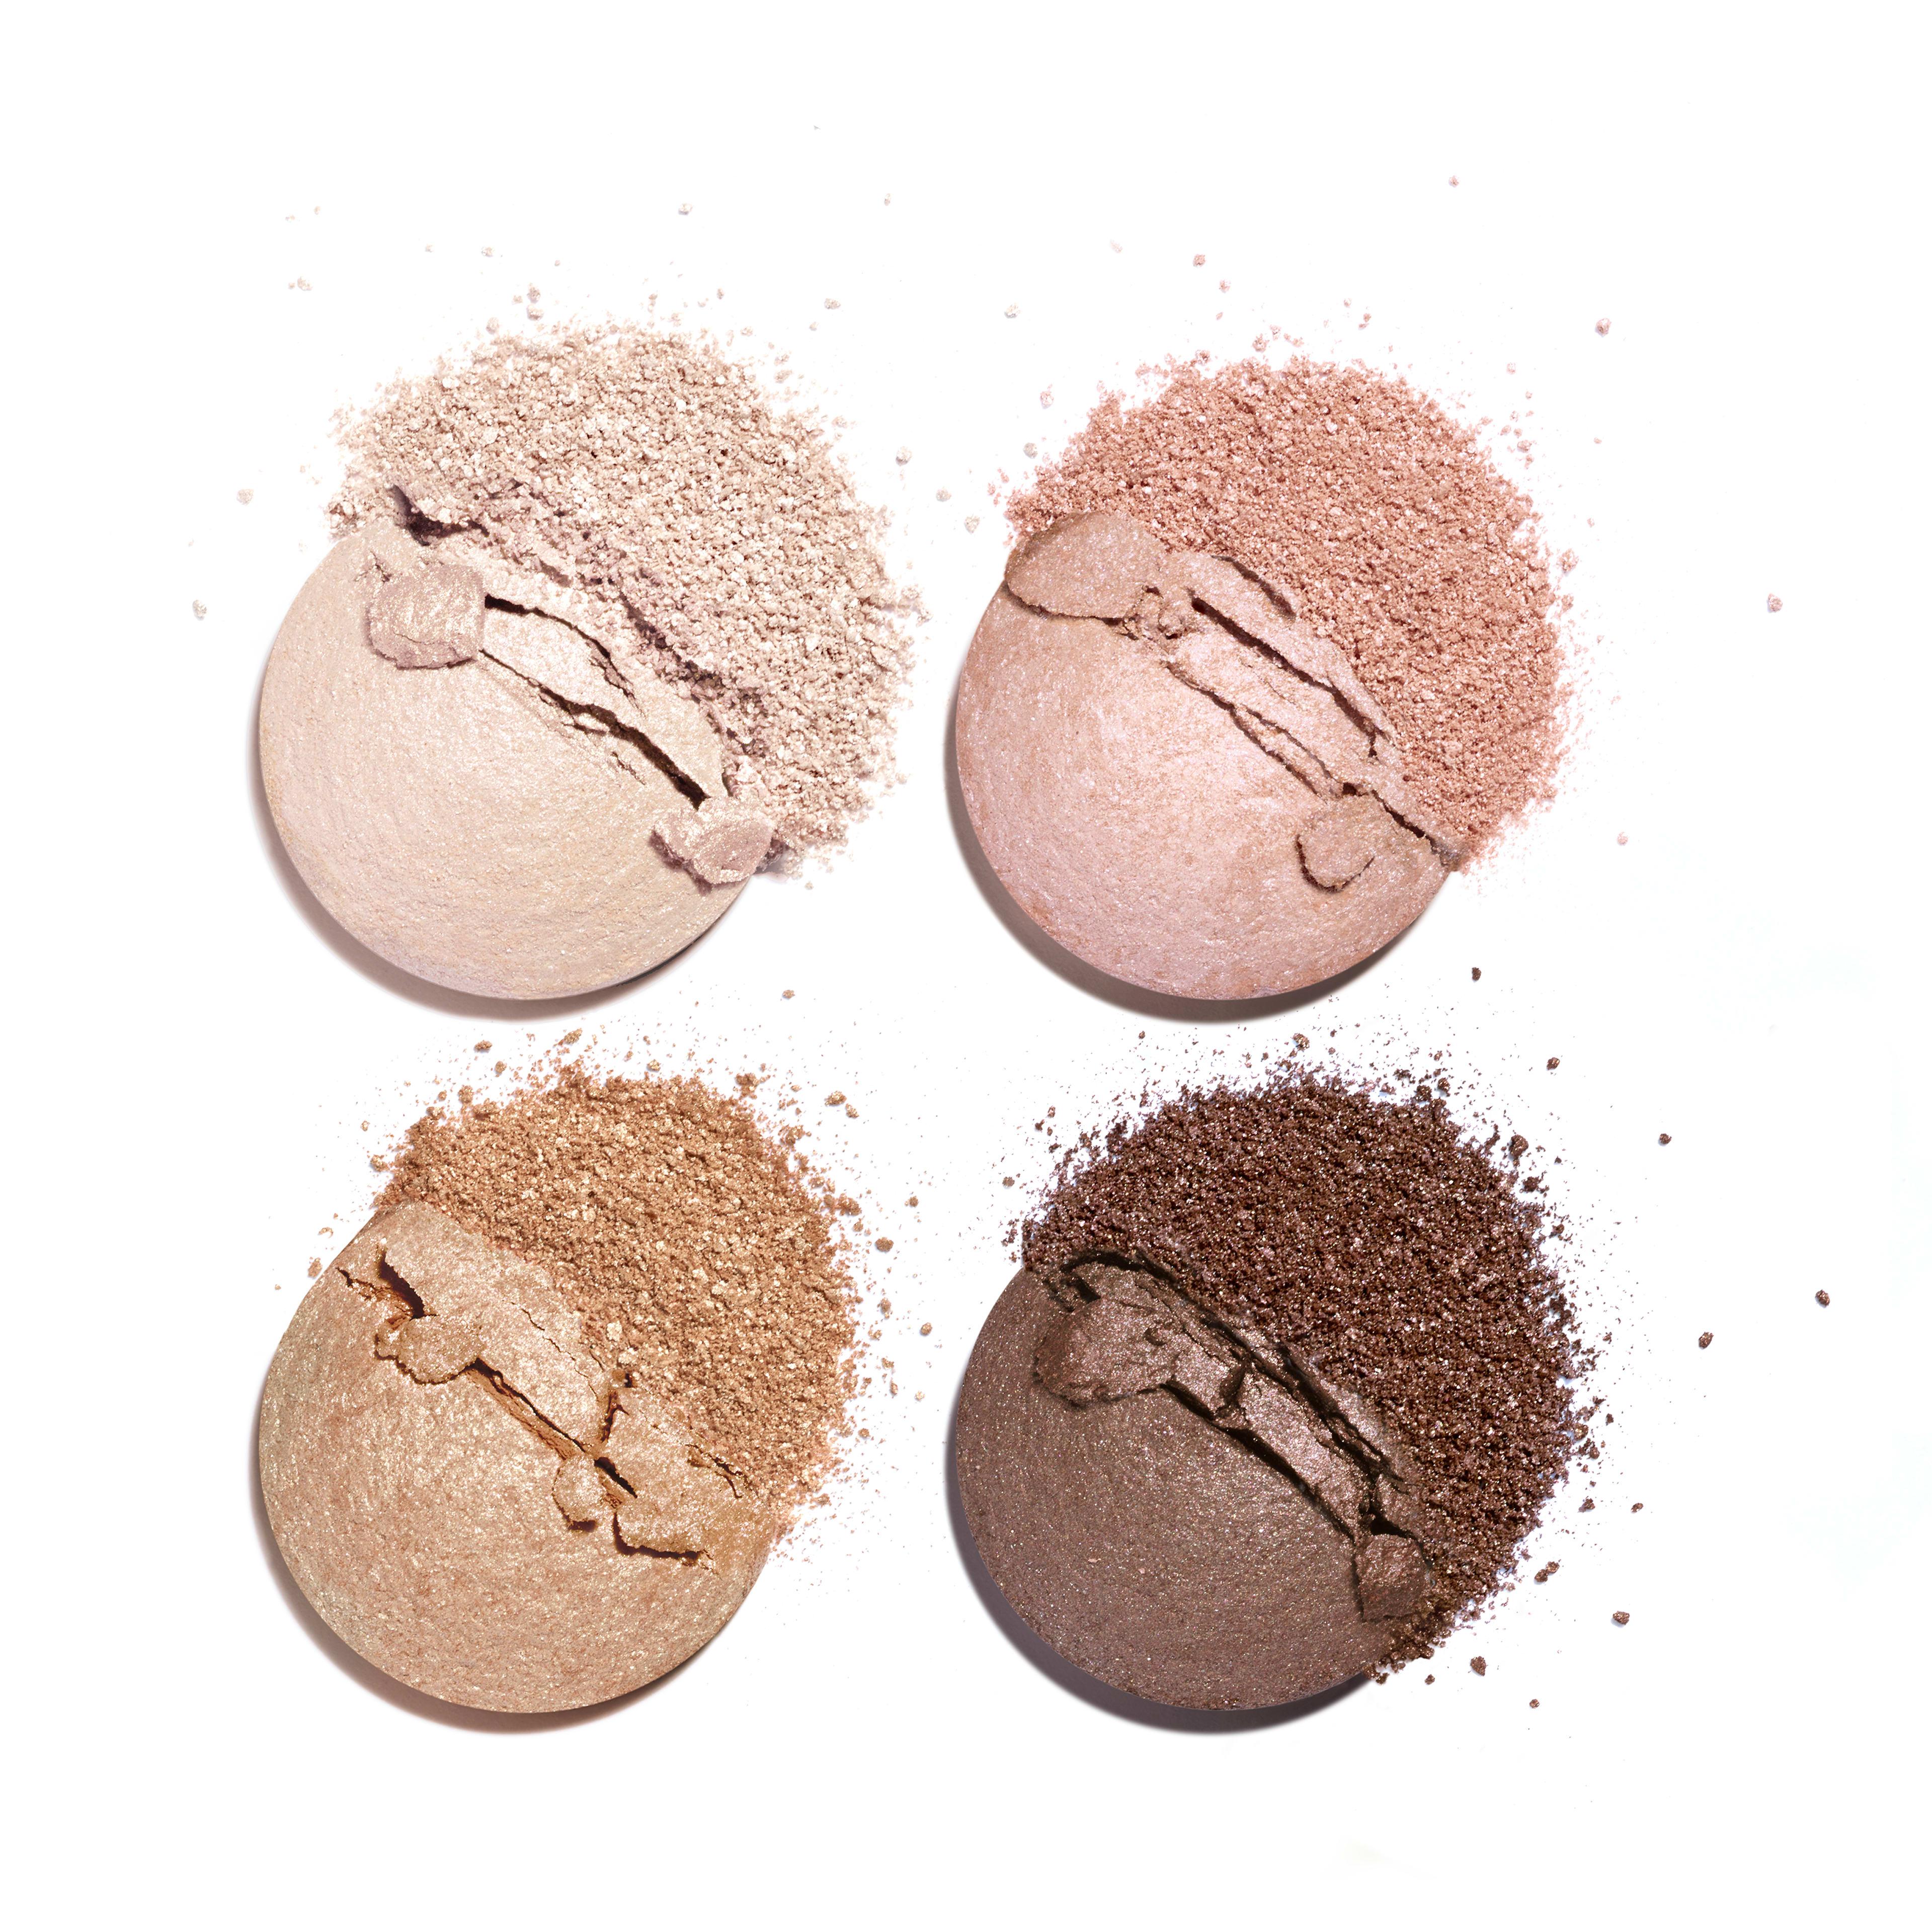 LES 4 OMBRES - makeup - 1.2g - Basic texture view